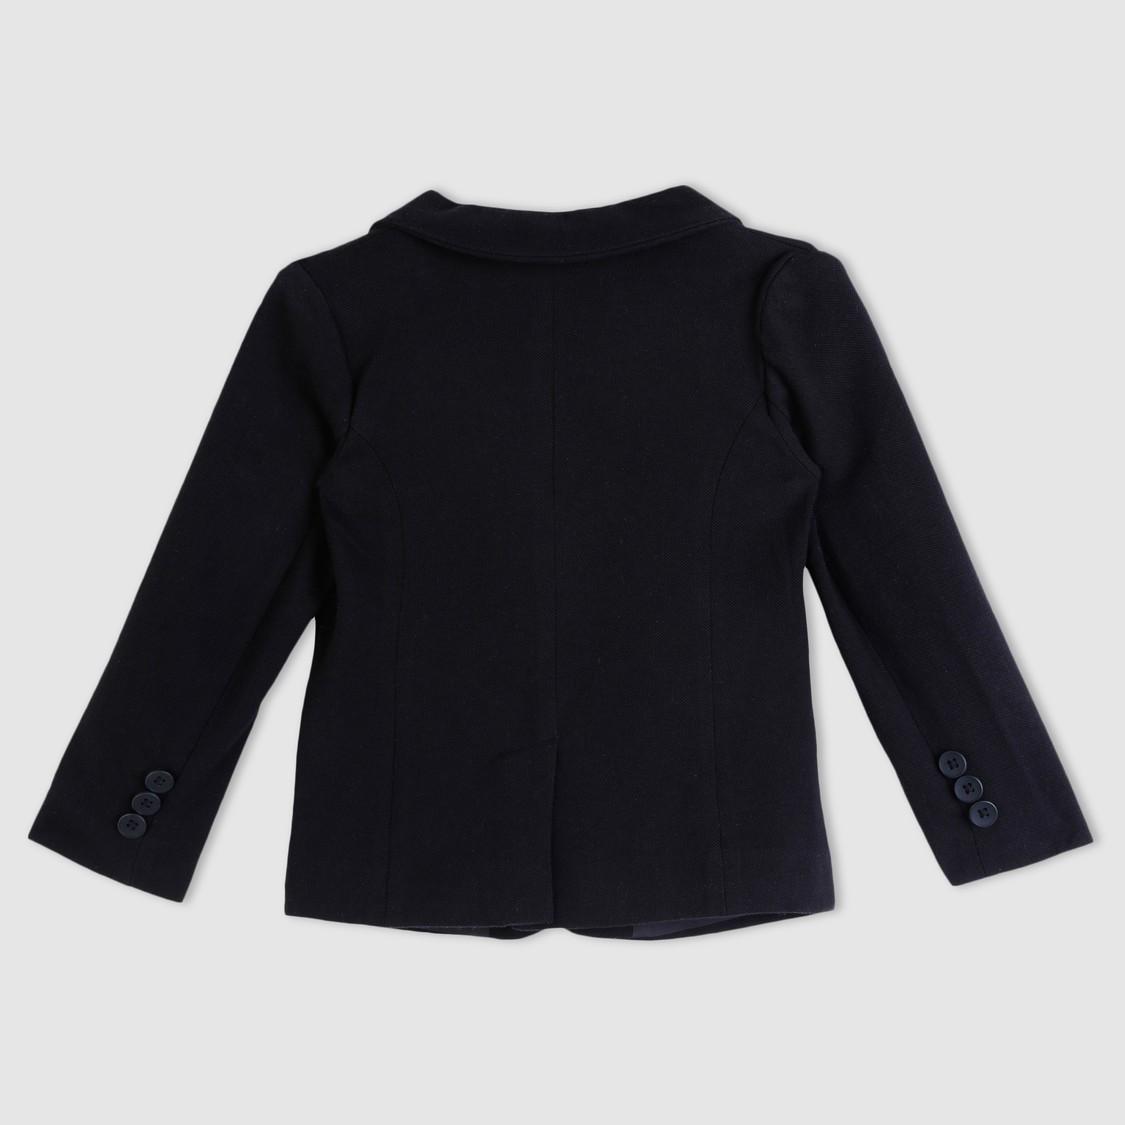 Notch Collar Long Sleeves Blazer